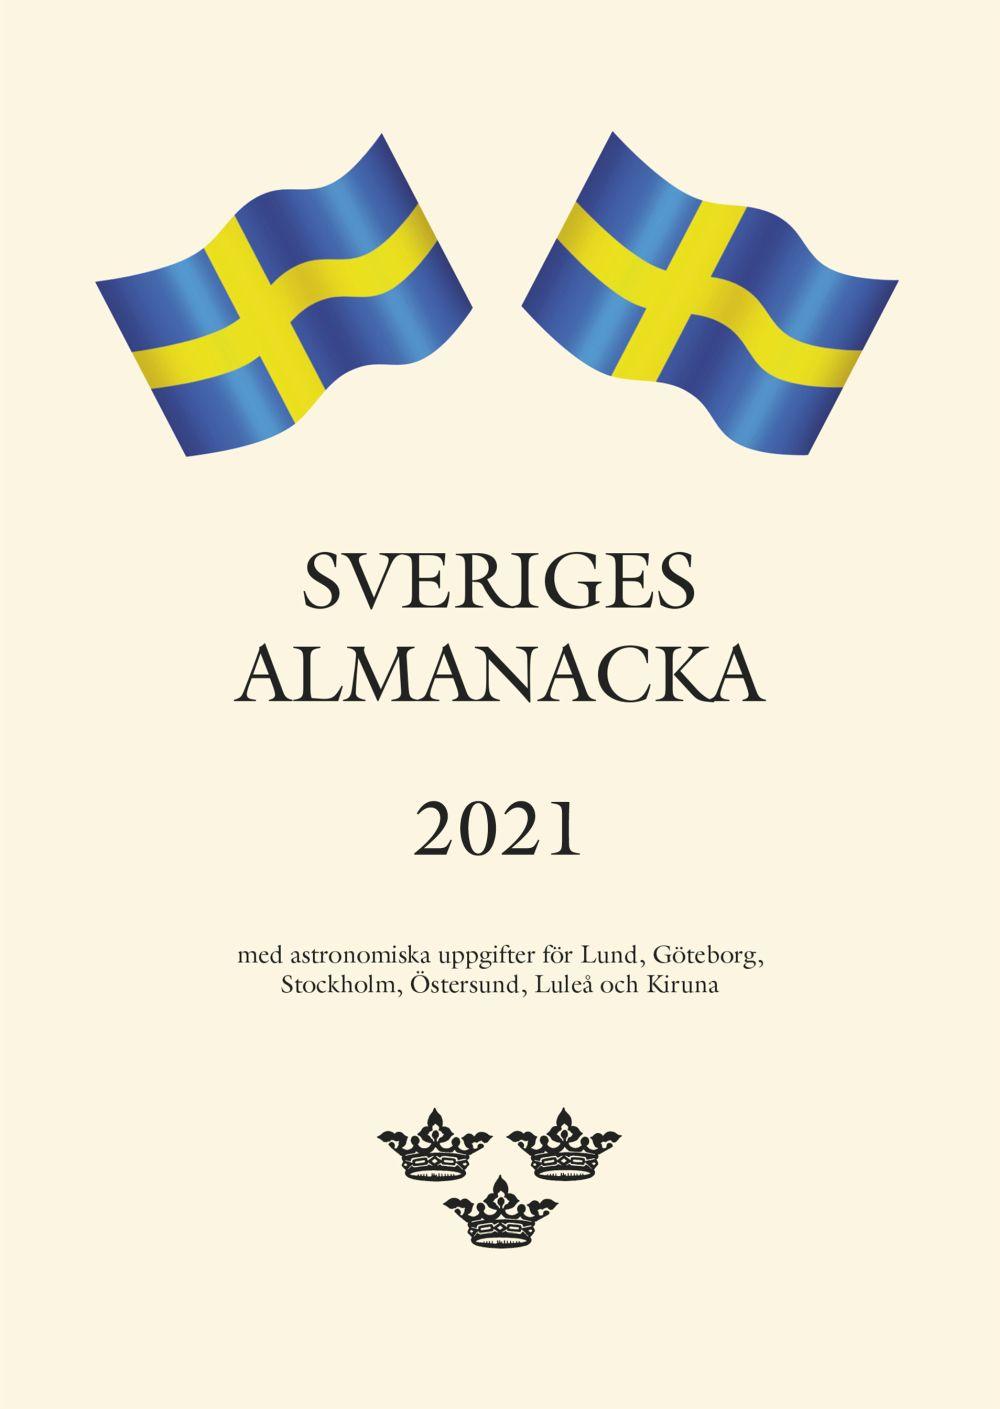 Fickkalender Burde 3070 Sveriges almanacka häftad